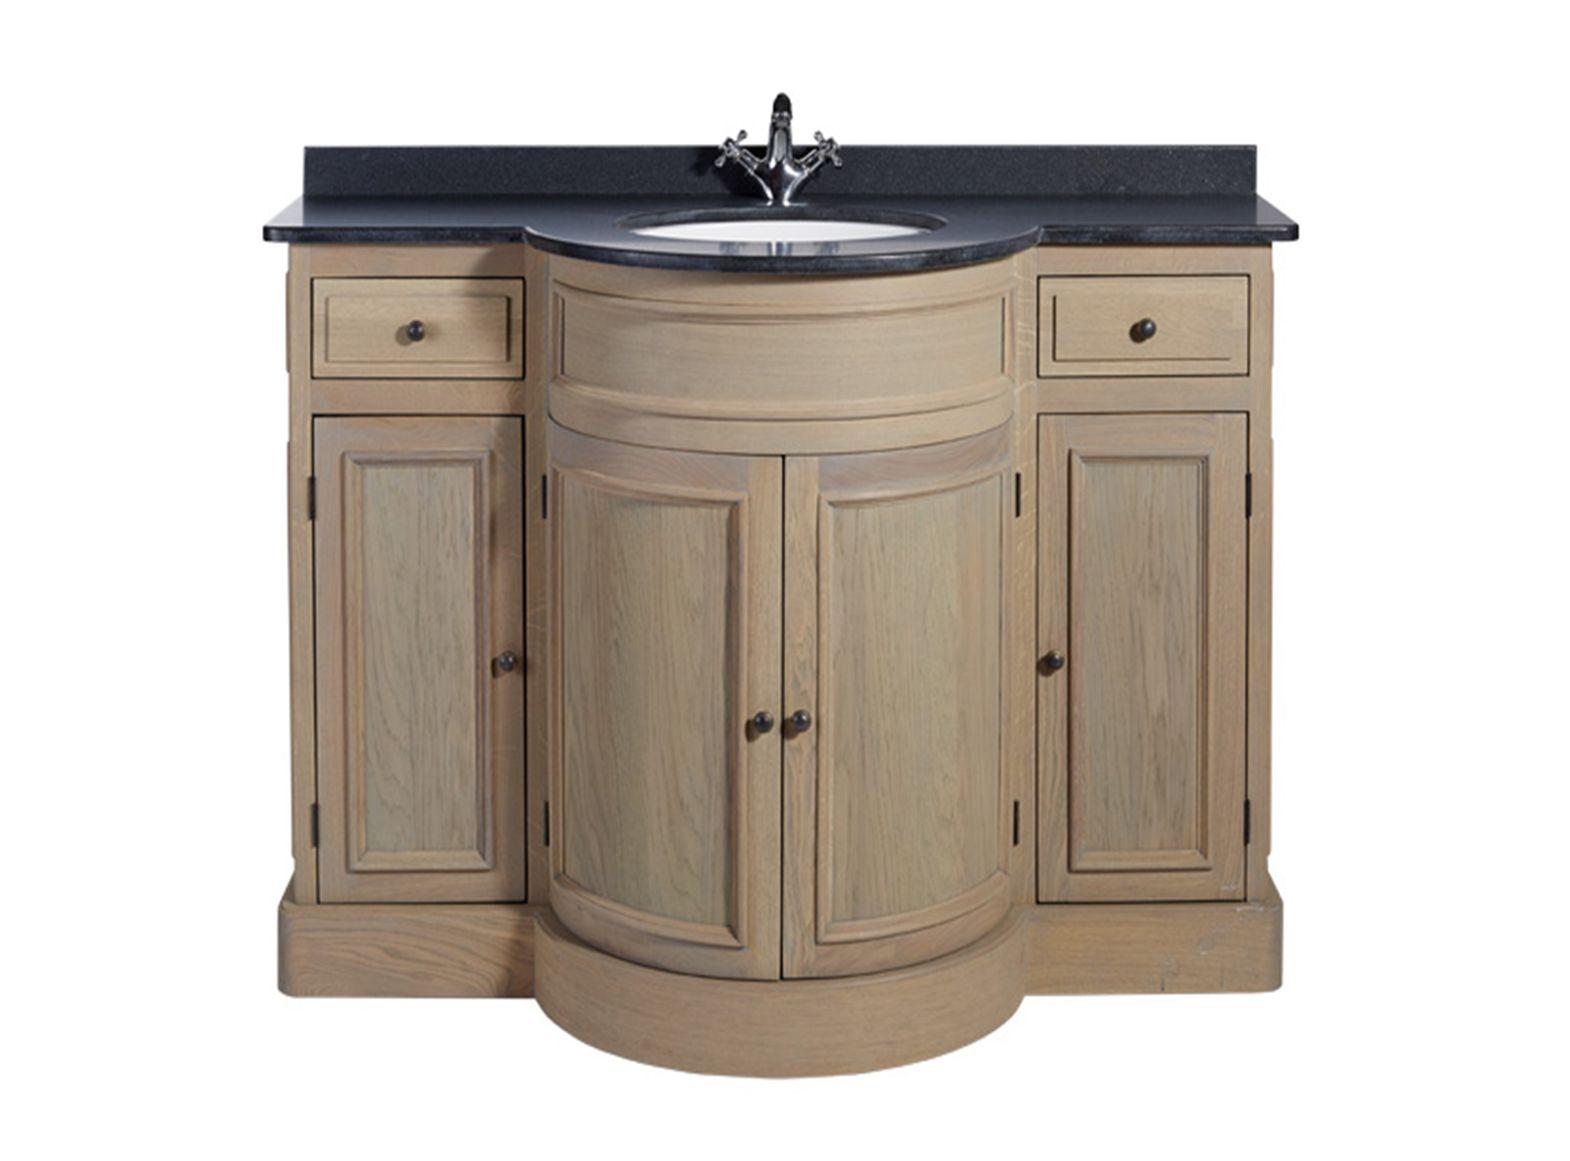 meuble salle de bain signature haussman rond. Black Bedroom Furniture Sets. Home Design Ideas